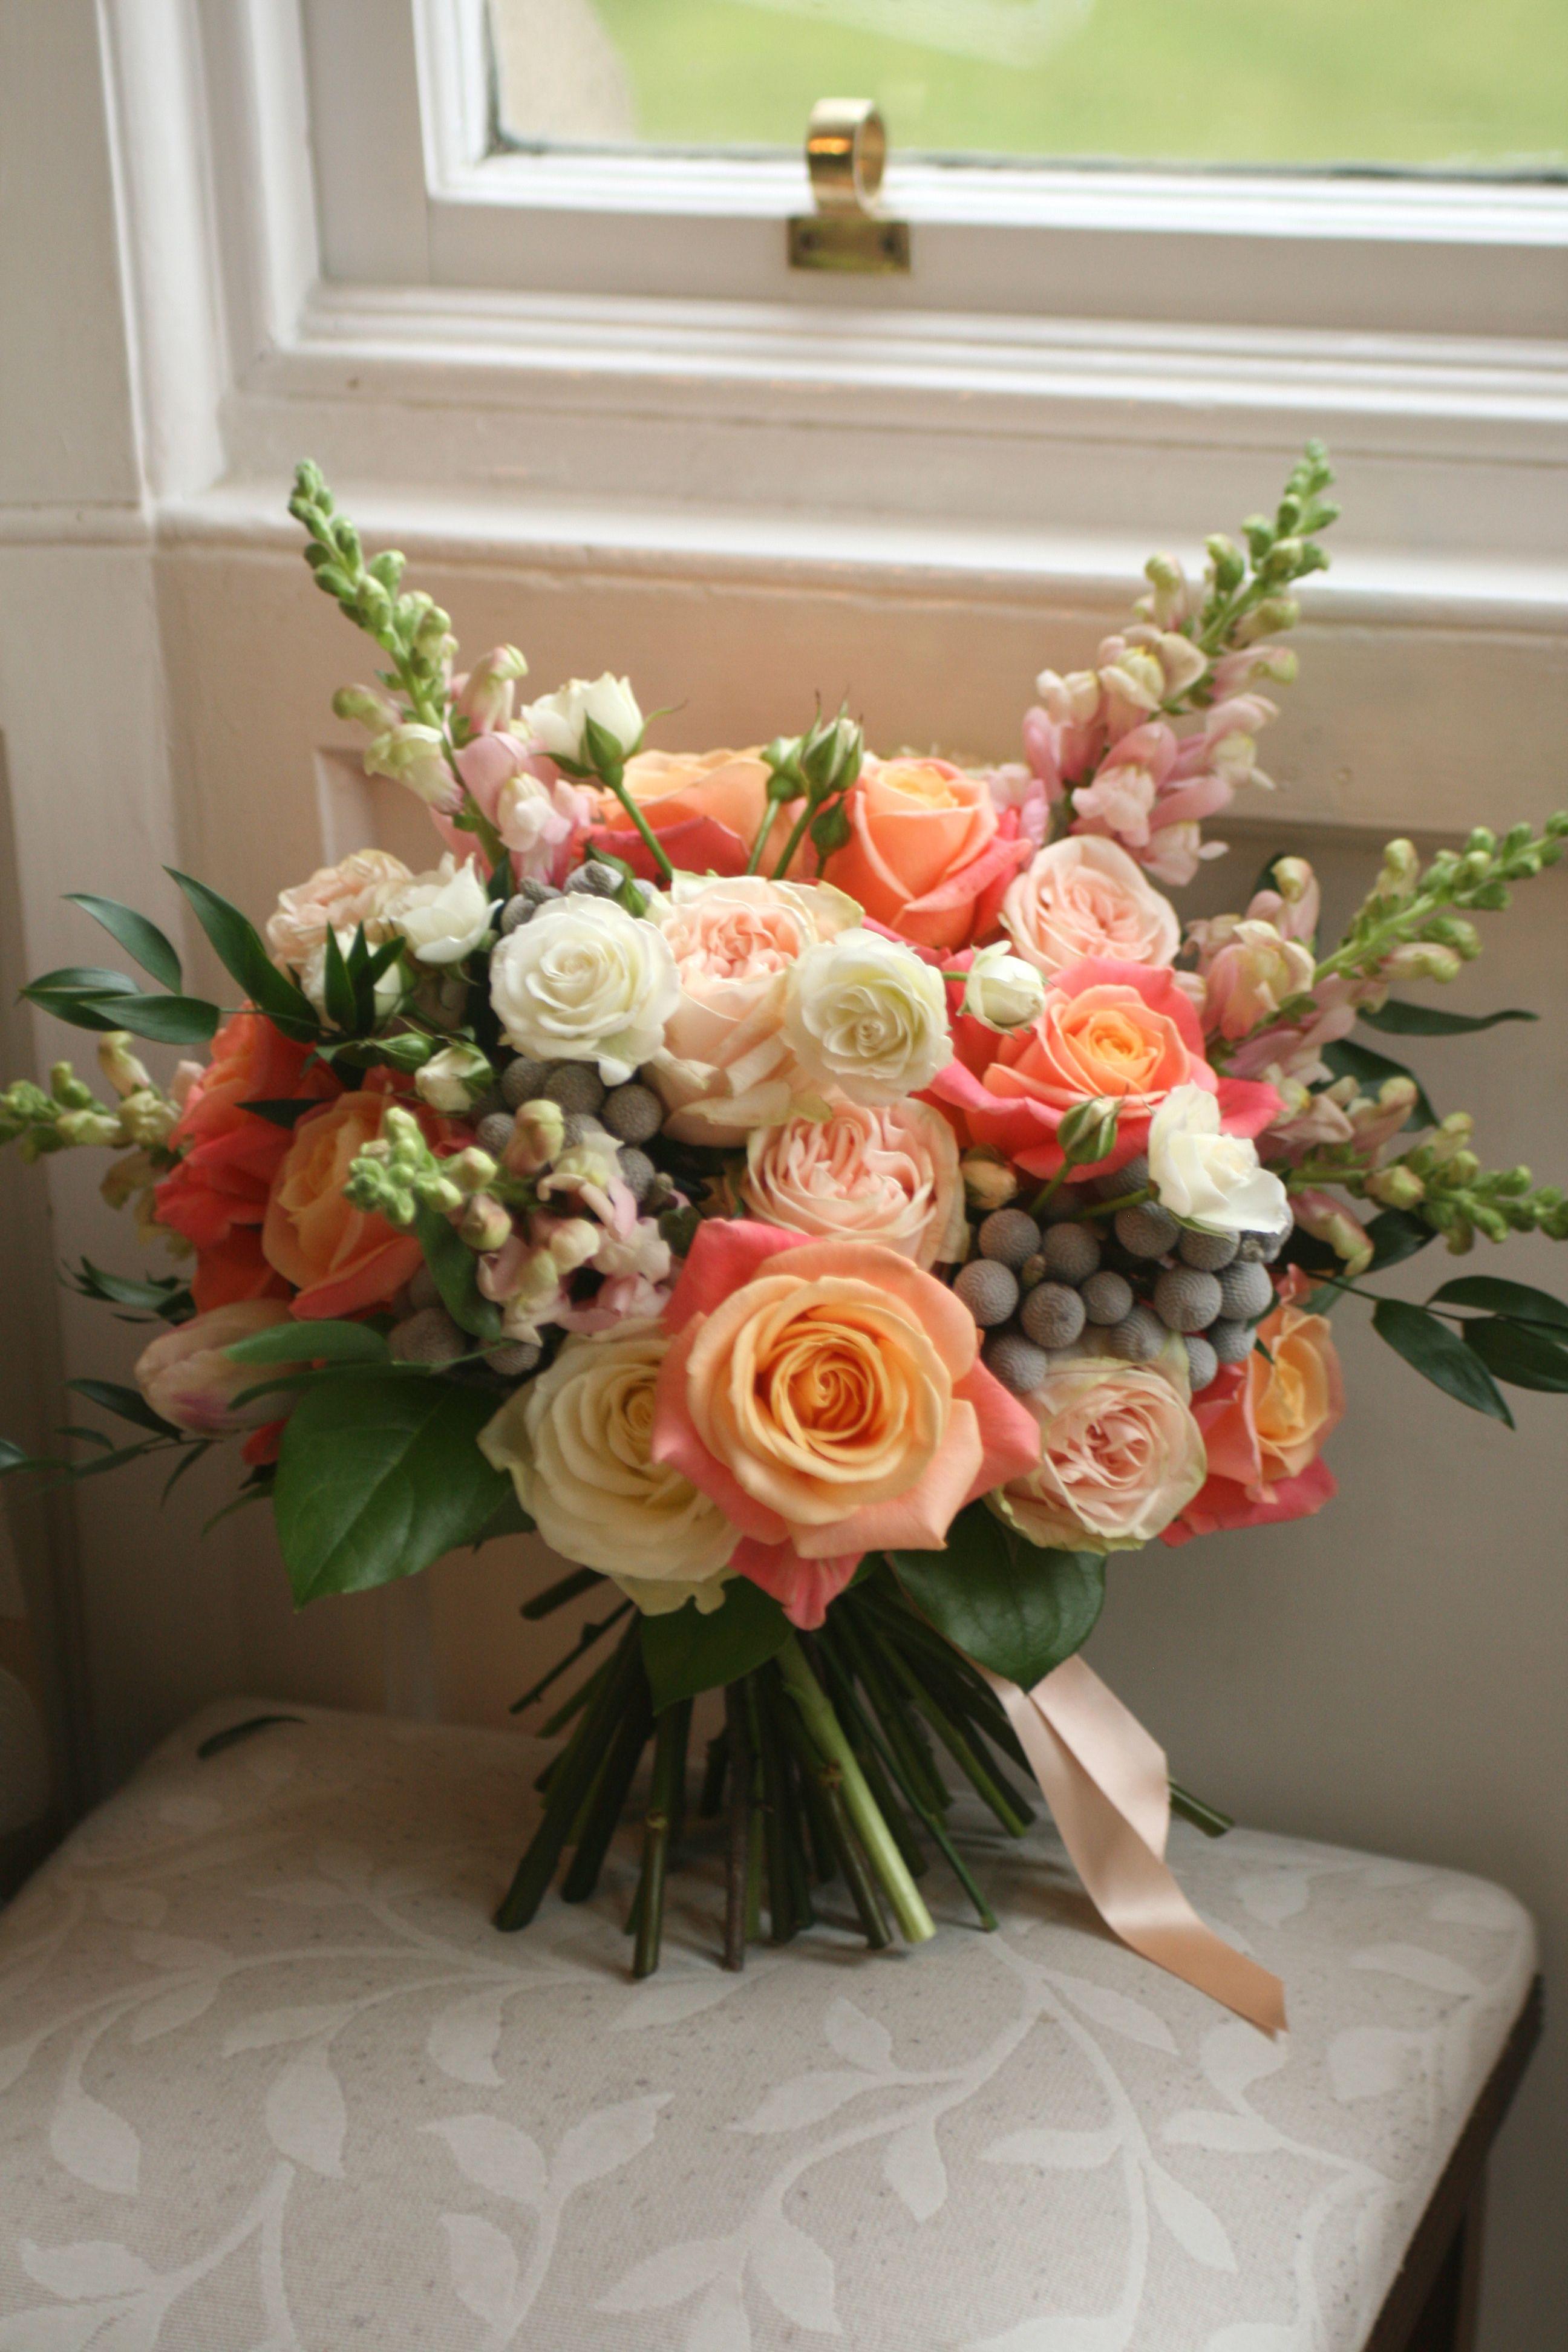 Brudebuketten i pink og fersken med roser, løvemund-7236